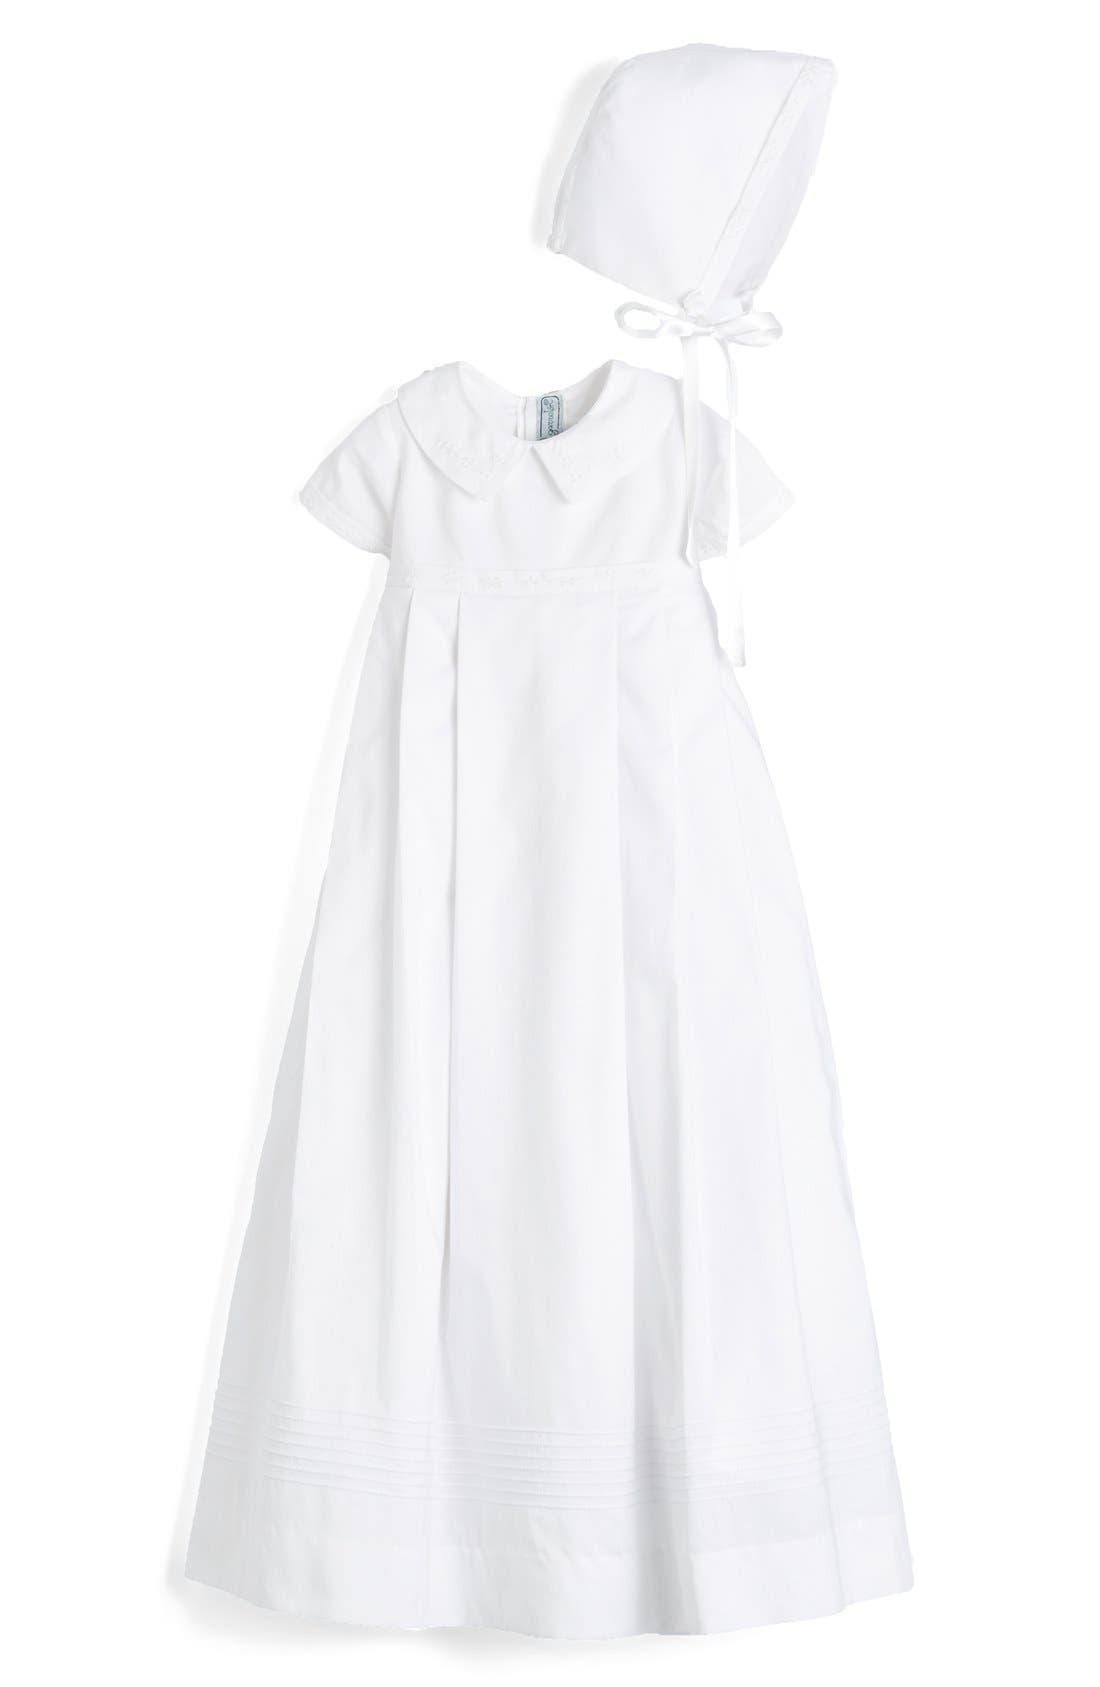 ISABEL GARRETON 'Classic' Christening Gown & Bonnet